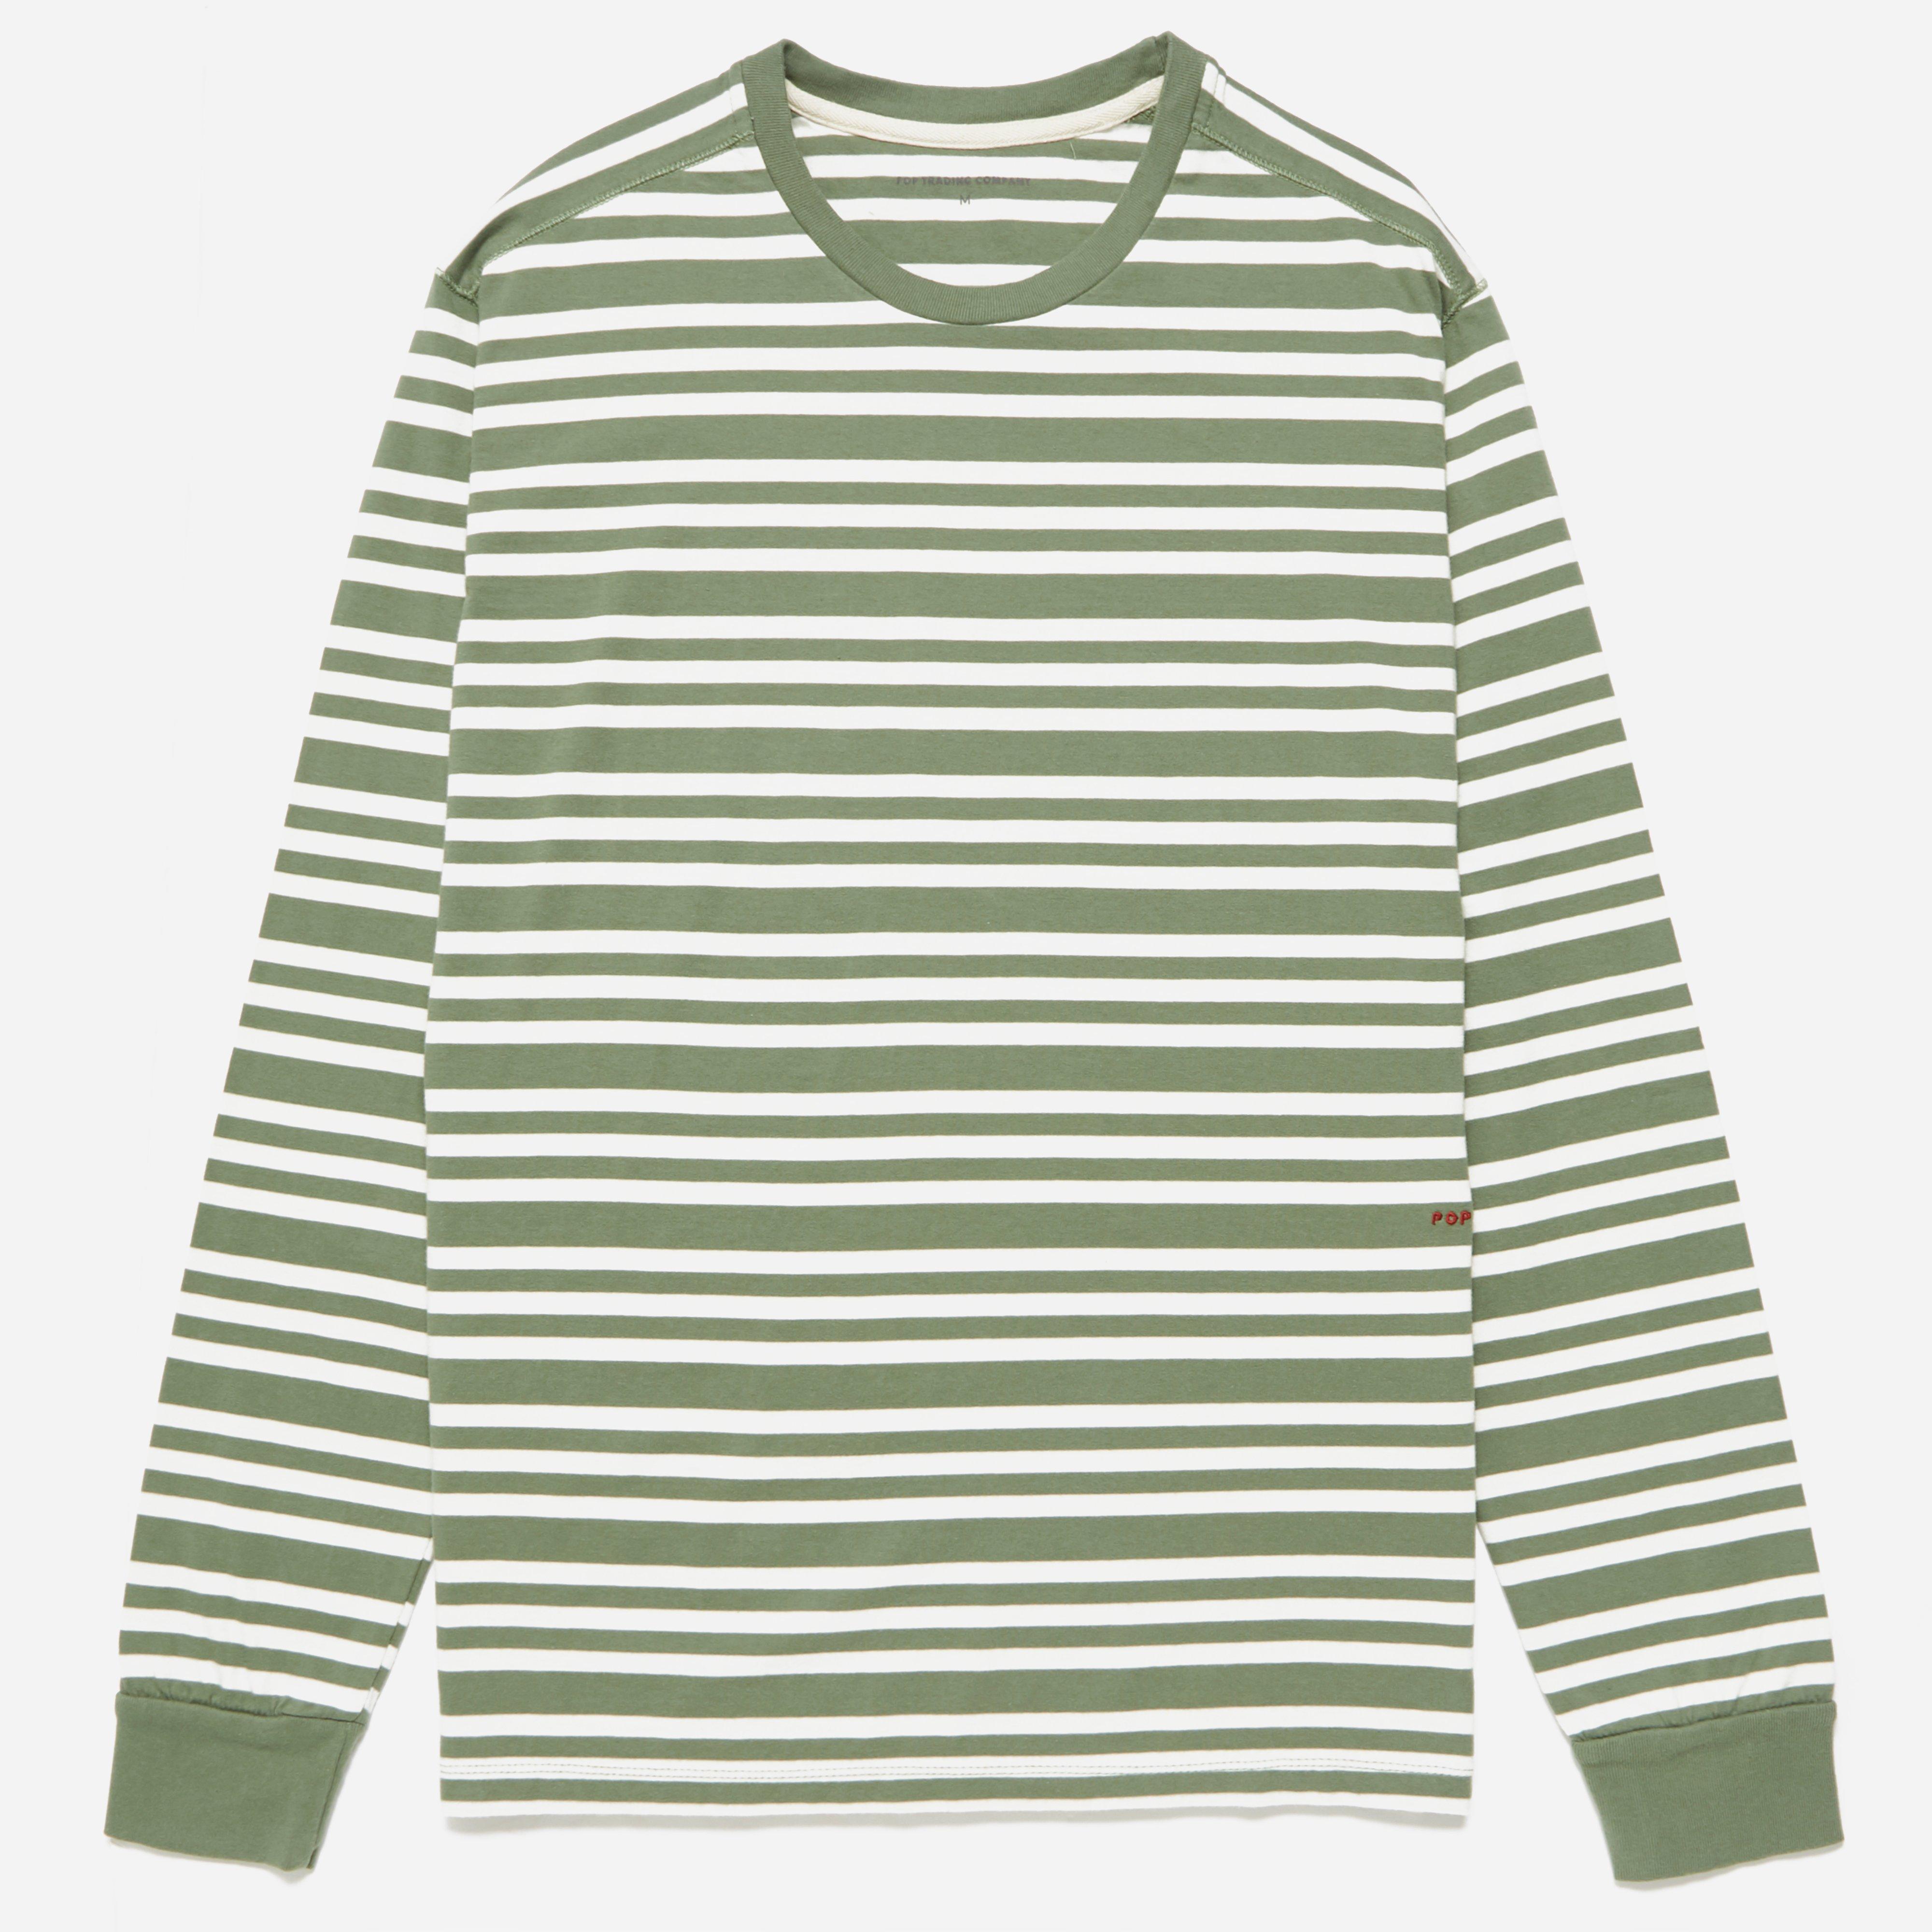 Pop Trading Company Triple Stripe Long Sleeve T-shirt